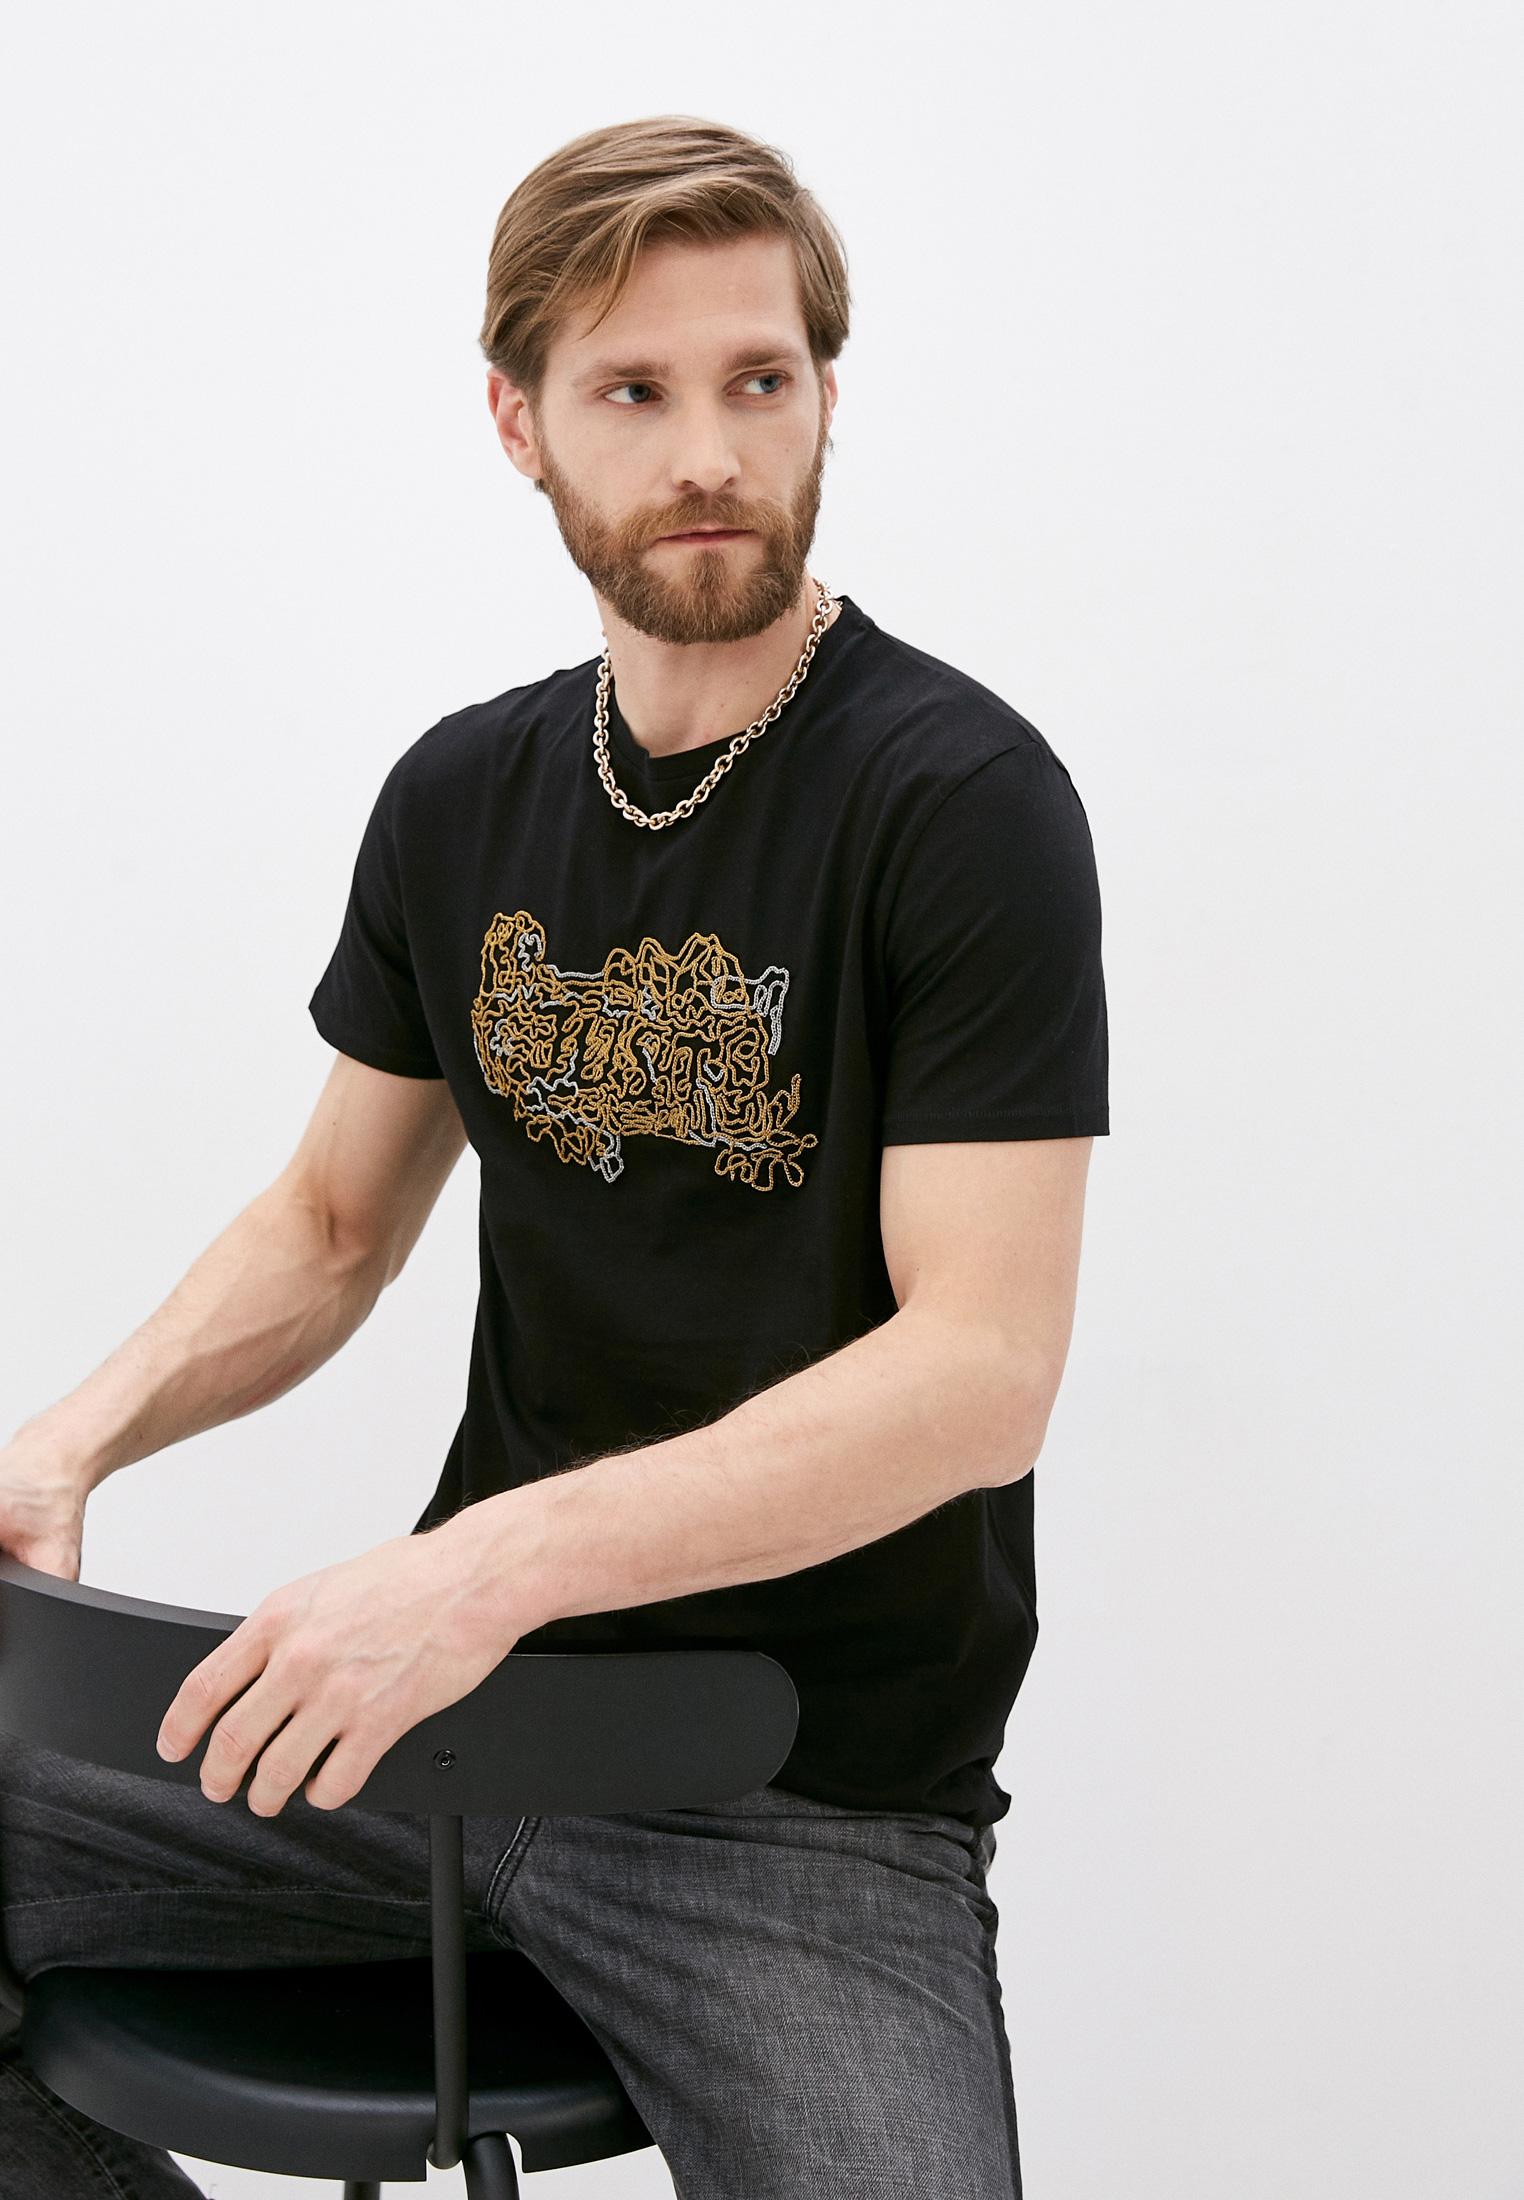 Мужская футболка Just Cavalli (Джаст Кавалли) S01GC0556N20663